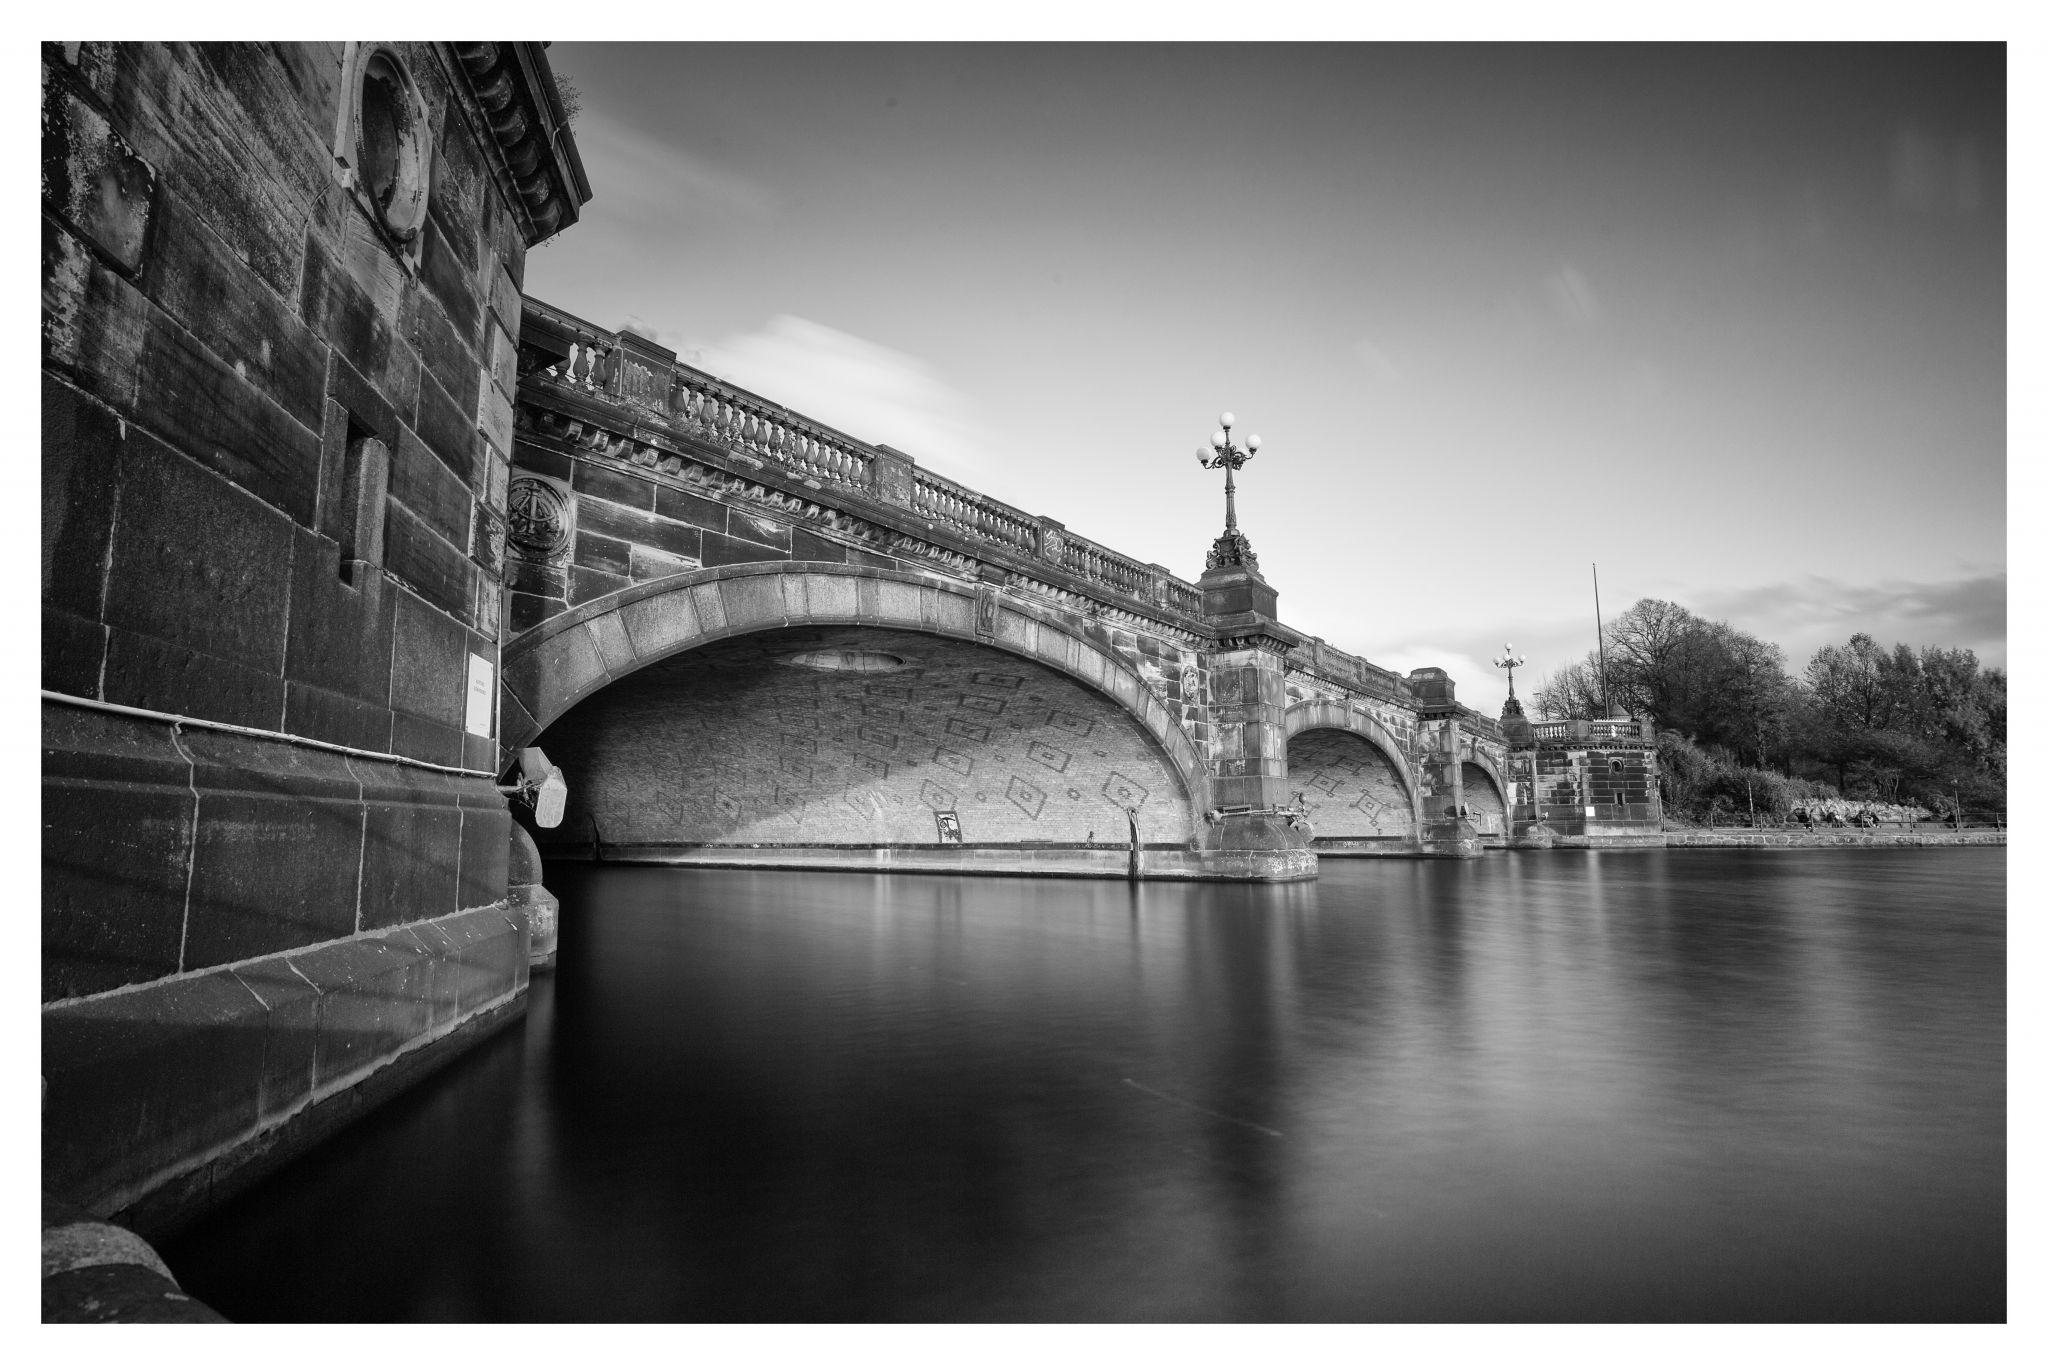 Hamburg Lombardsbrücke, Germany